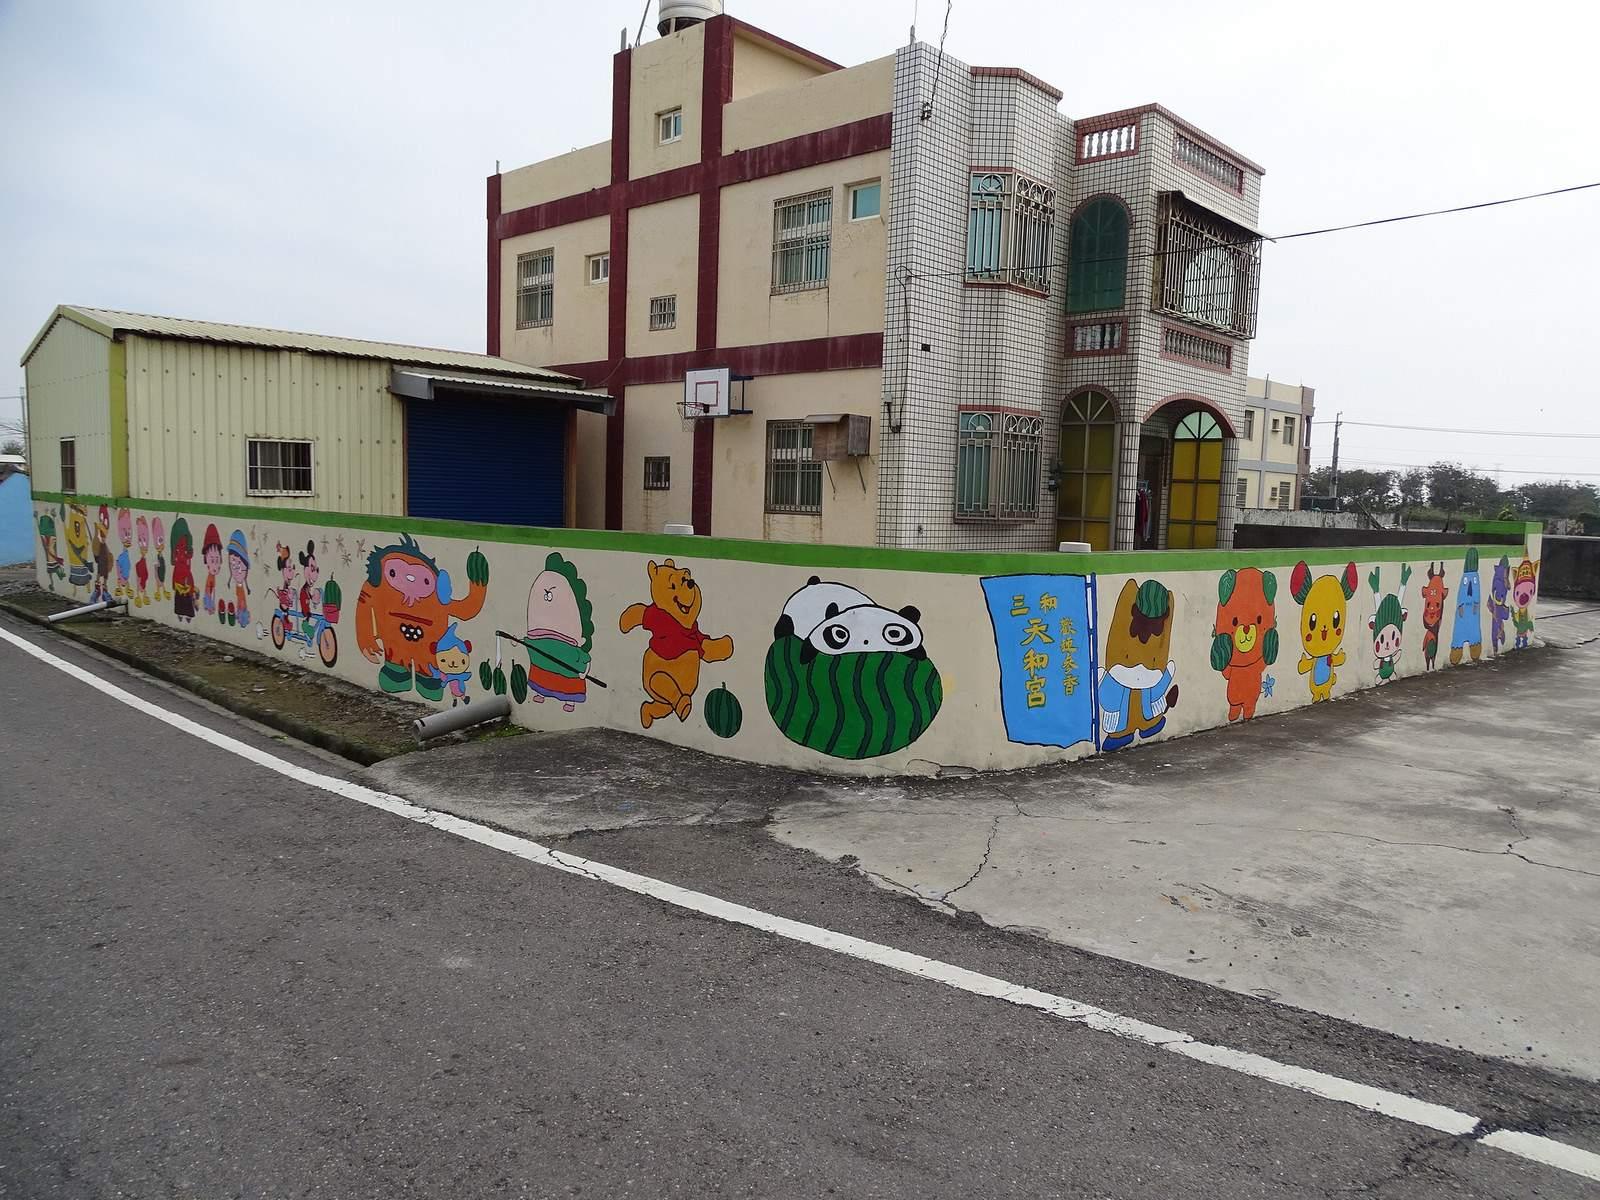 painted village26 Painted Fubao Village in Changhua